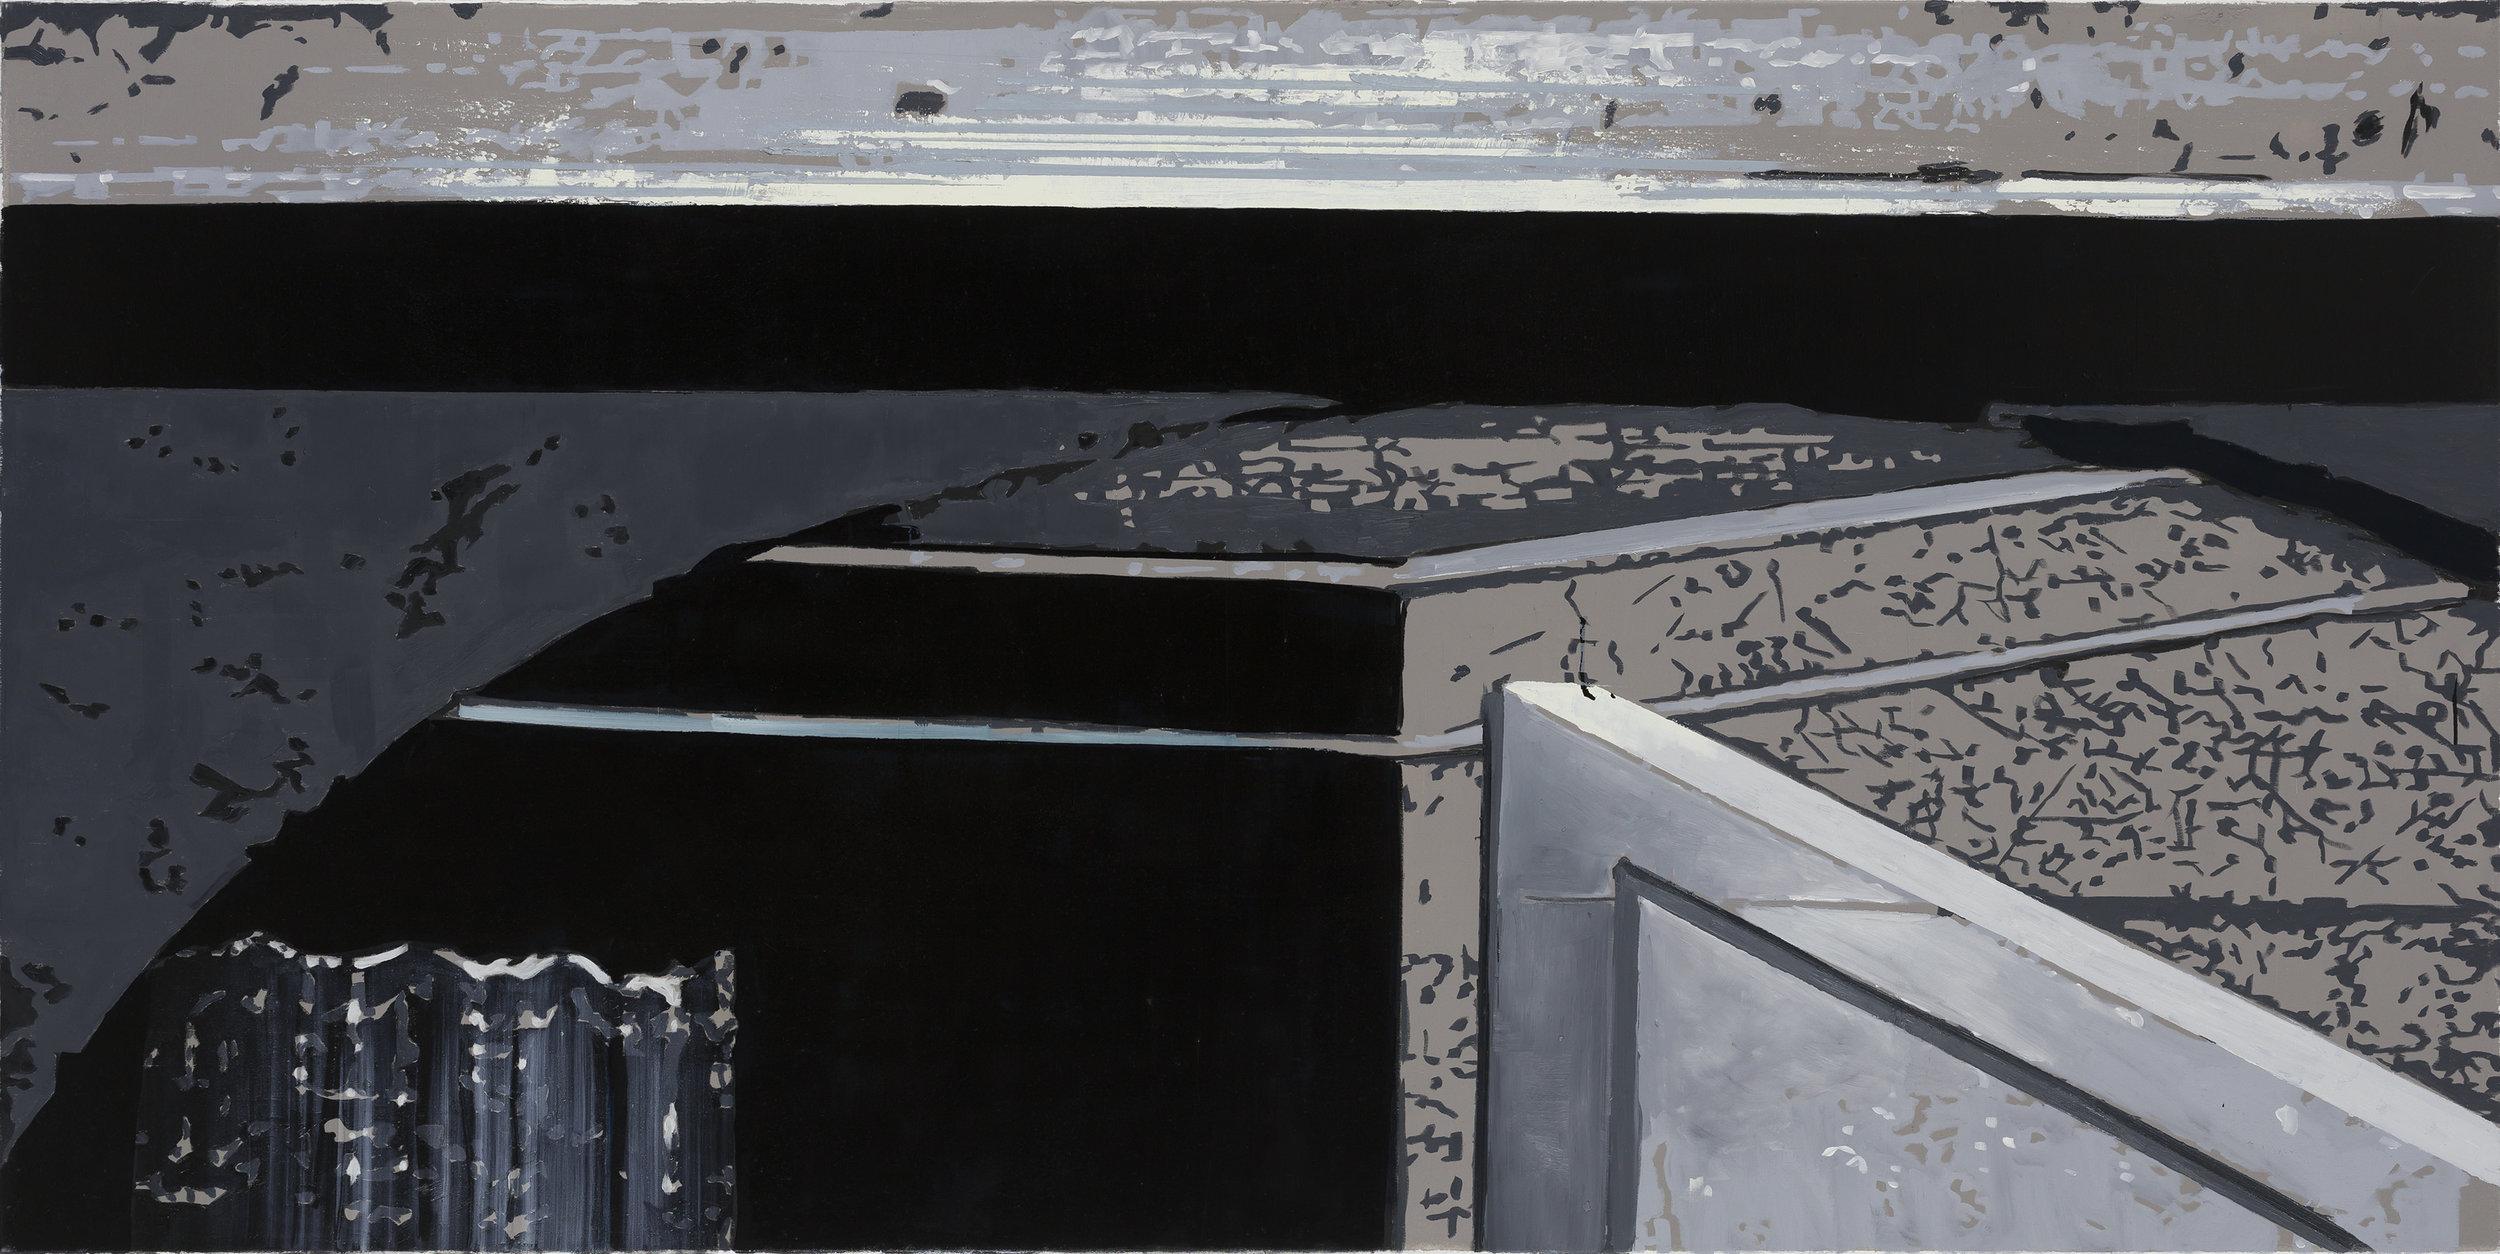 Oren Eliav, Corner, Oil on canvas